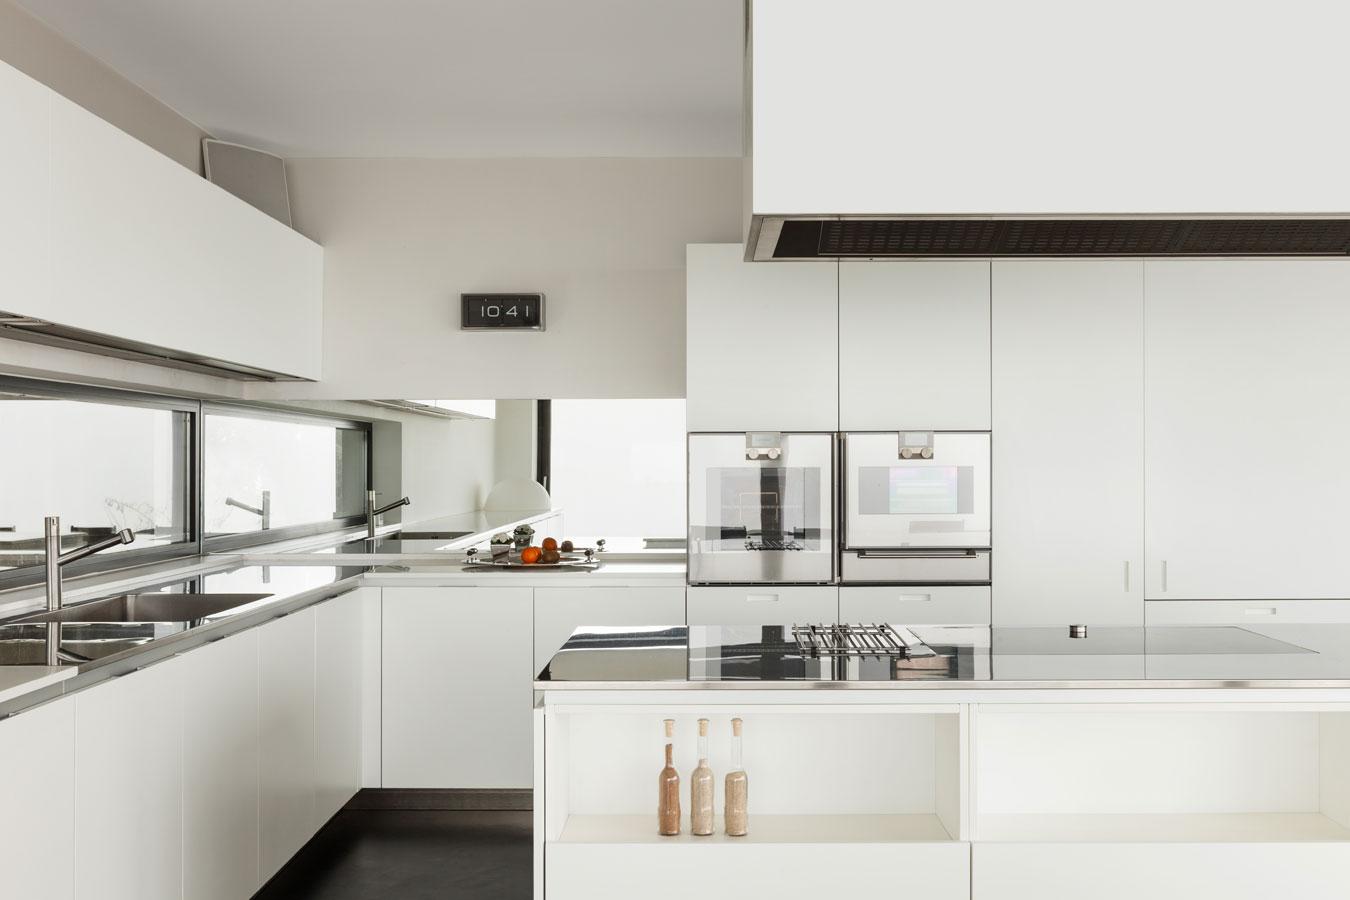 Keukenkast op maat - Keukens fotos ...